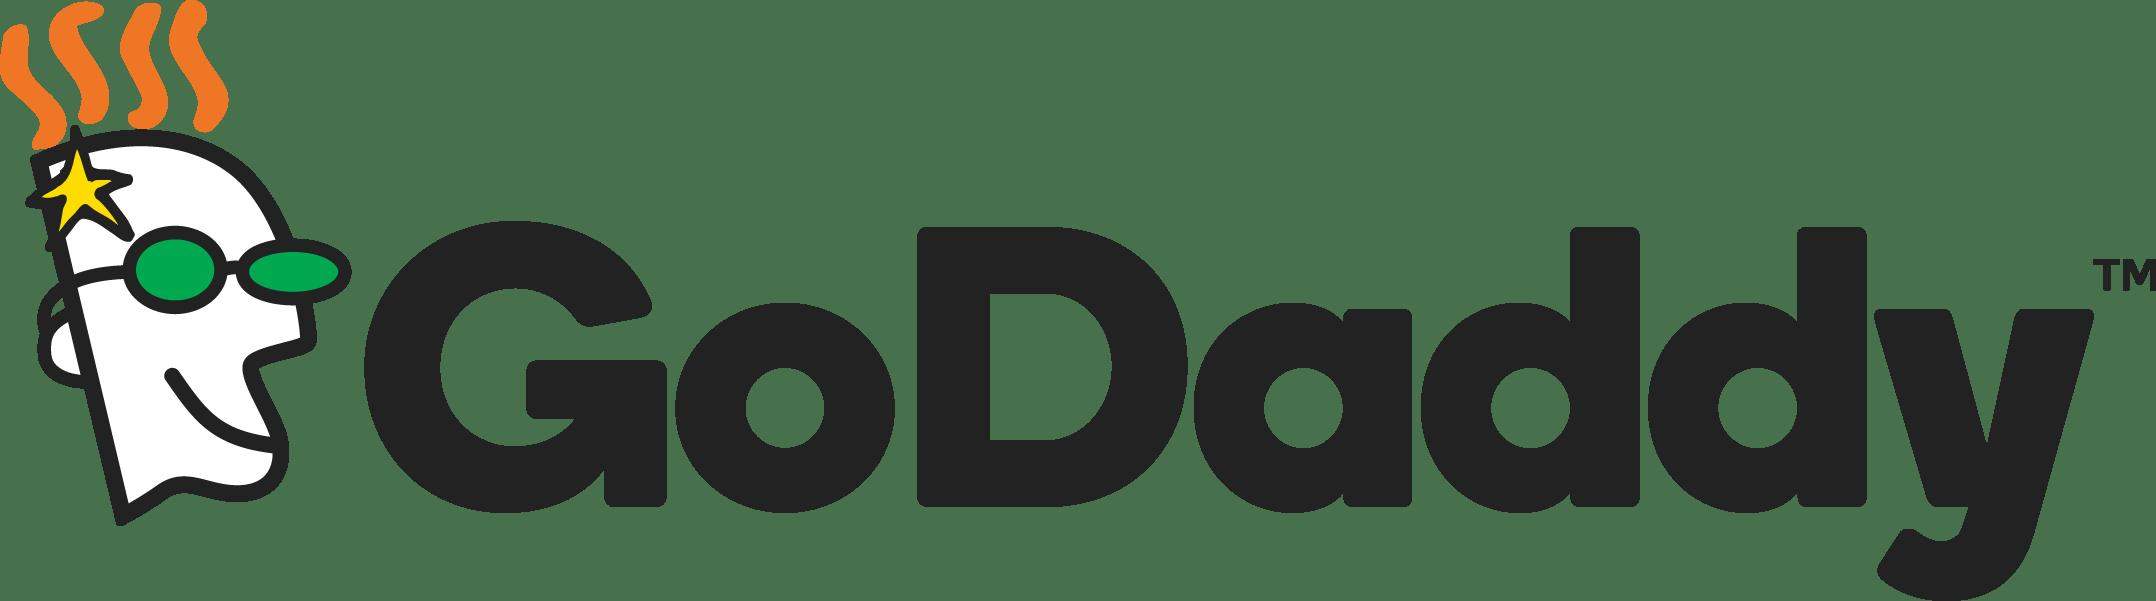 GoDaddy Logo png